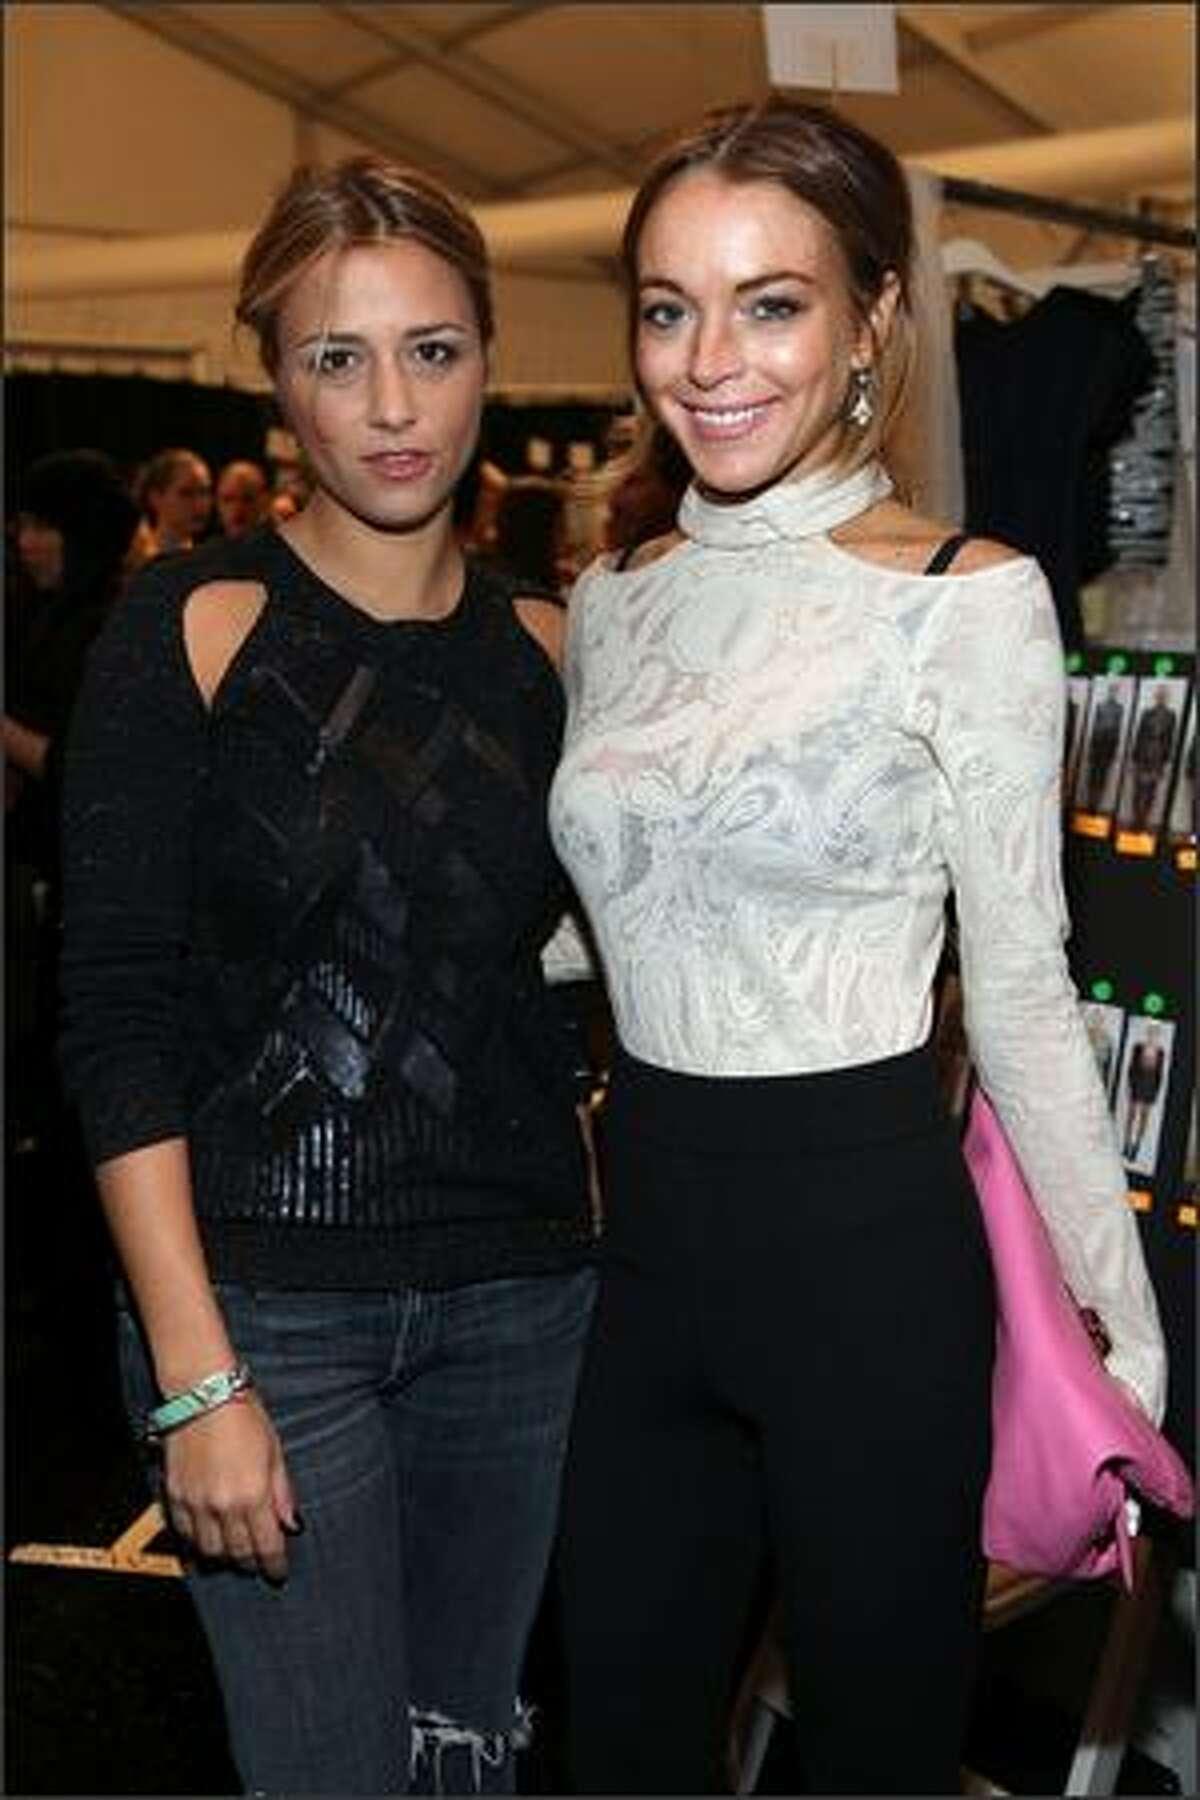 Designer Charlotte Ronson (left) and actress Lindsay Lohan pose backstage at the Charlotte Ronson show.